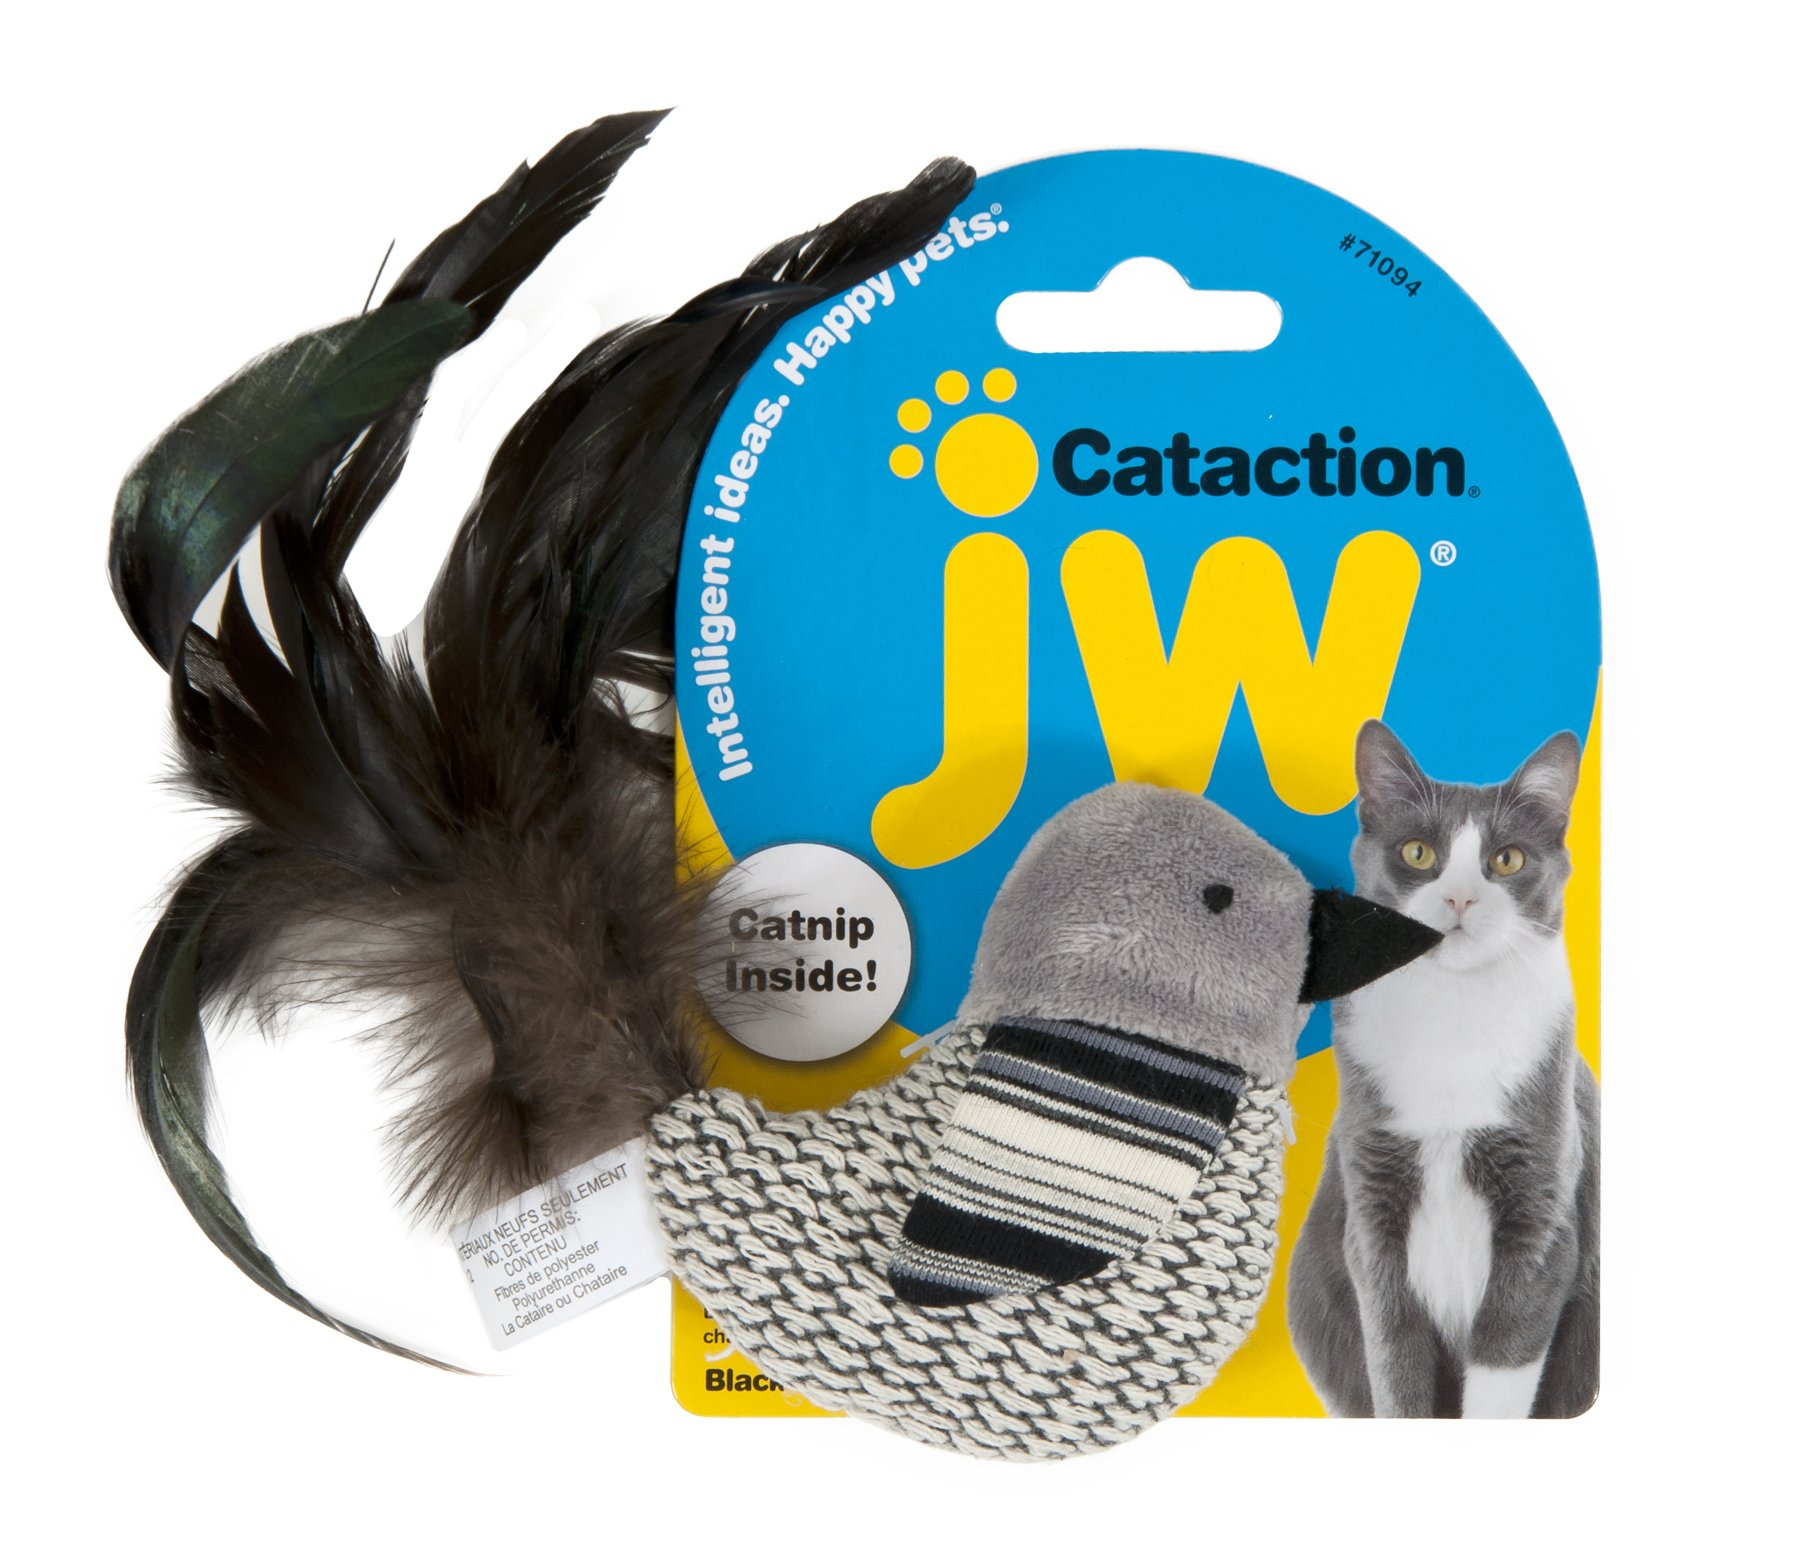 JW Pet Cataction Bird Toy, Black/White